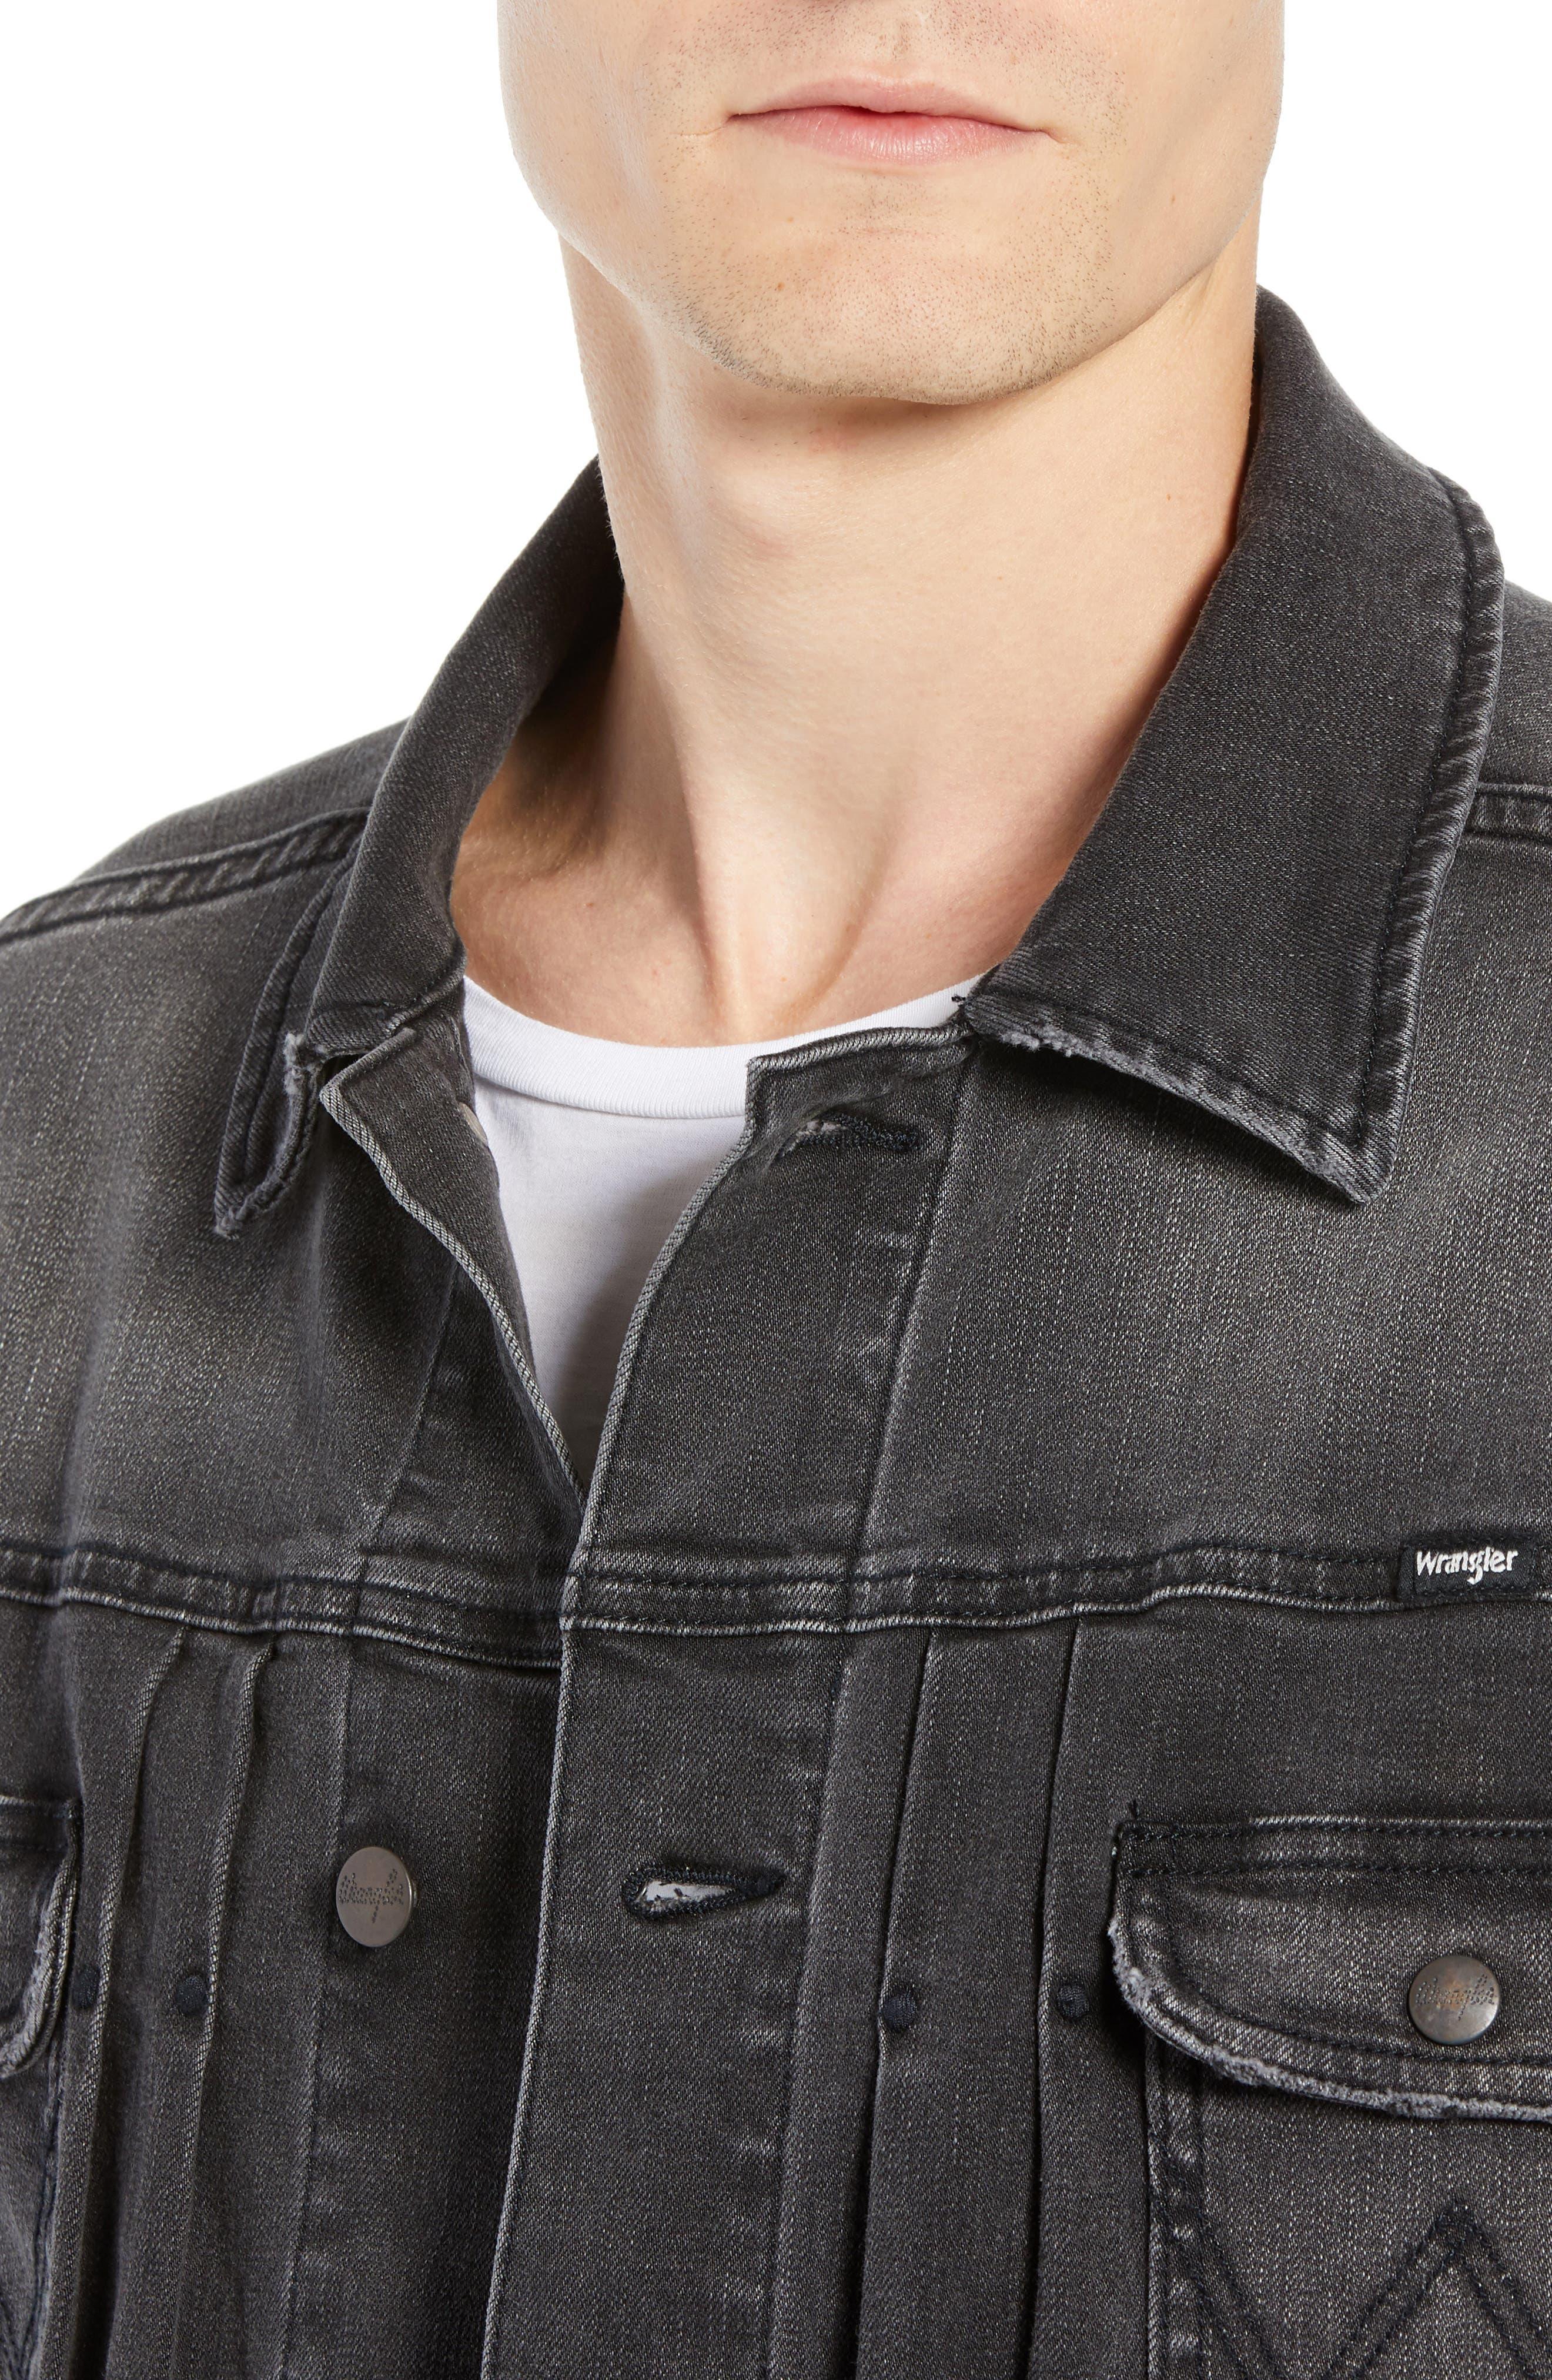 WRANGLER, Heritage Pleated Denim Jacket, Alternate thumbnail 5, color, 020